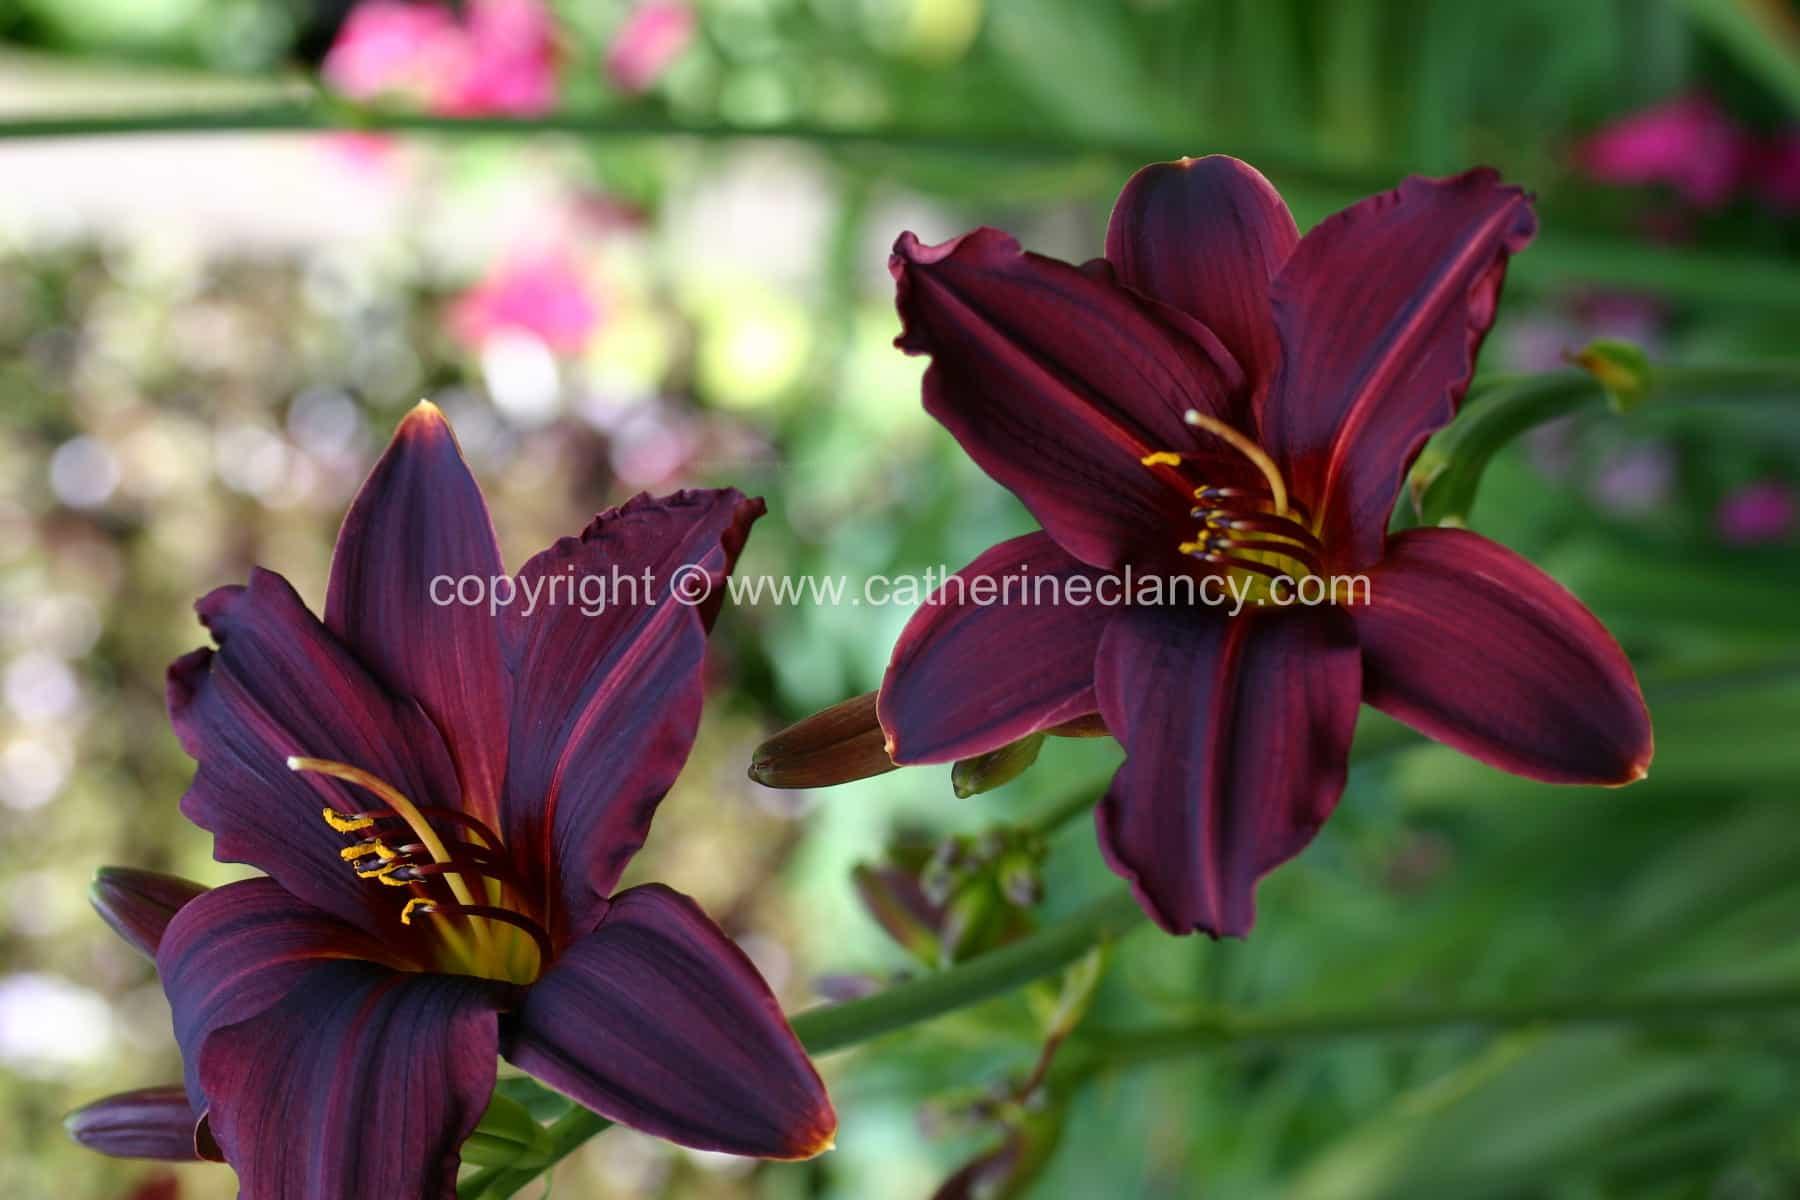 blackheath-walled-garden-day-lily